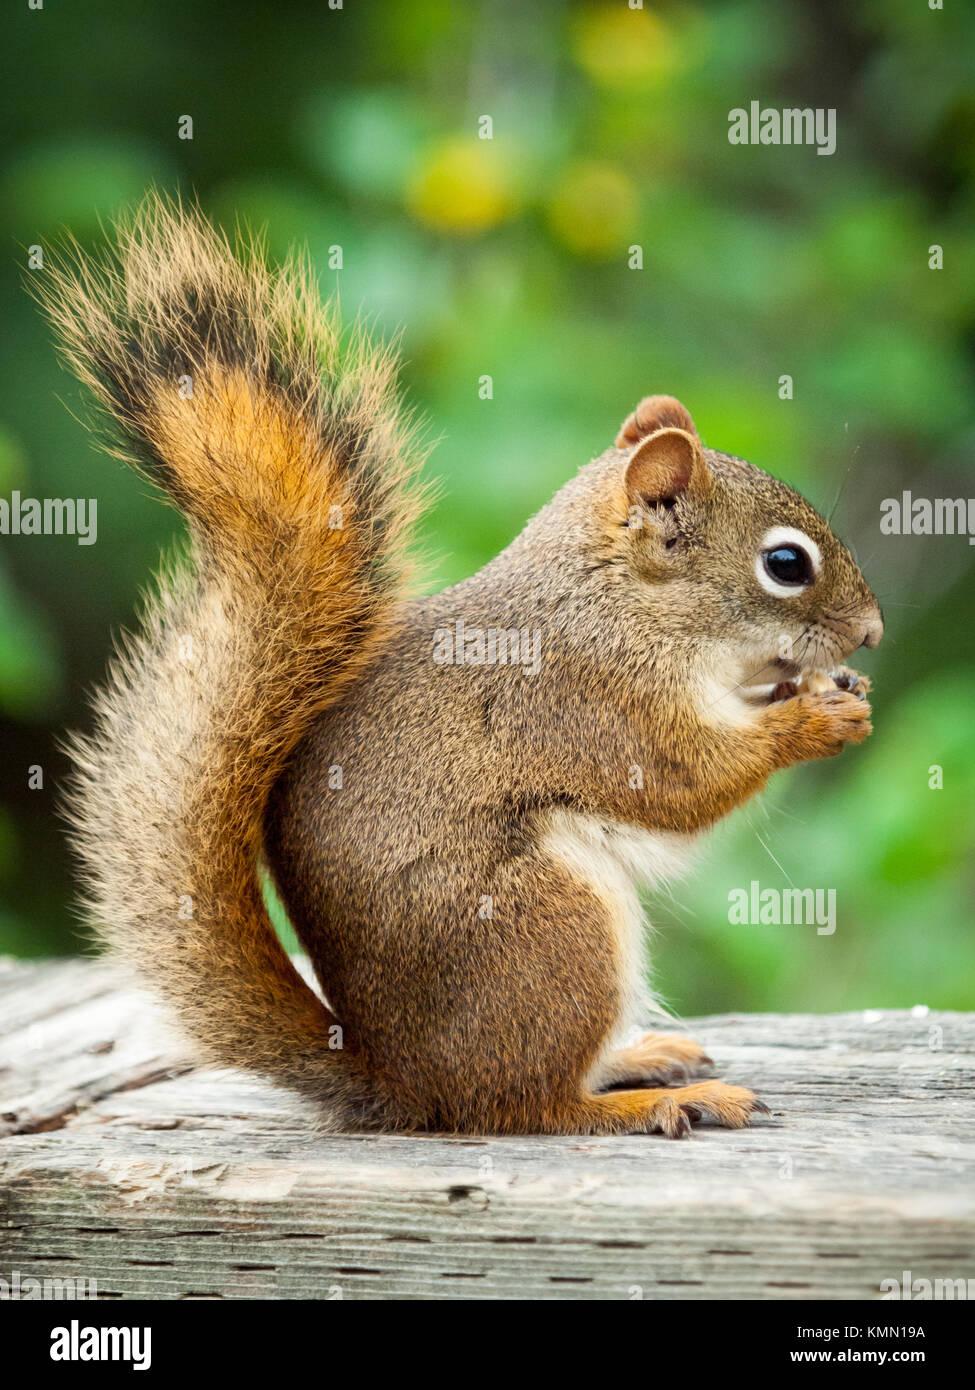 An American red squirrel (Tamiasciurus hudsonicus), in squirrel profile, feeding at Whitemud Park and Nature Reserve - Stock Image